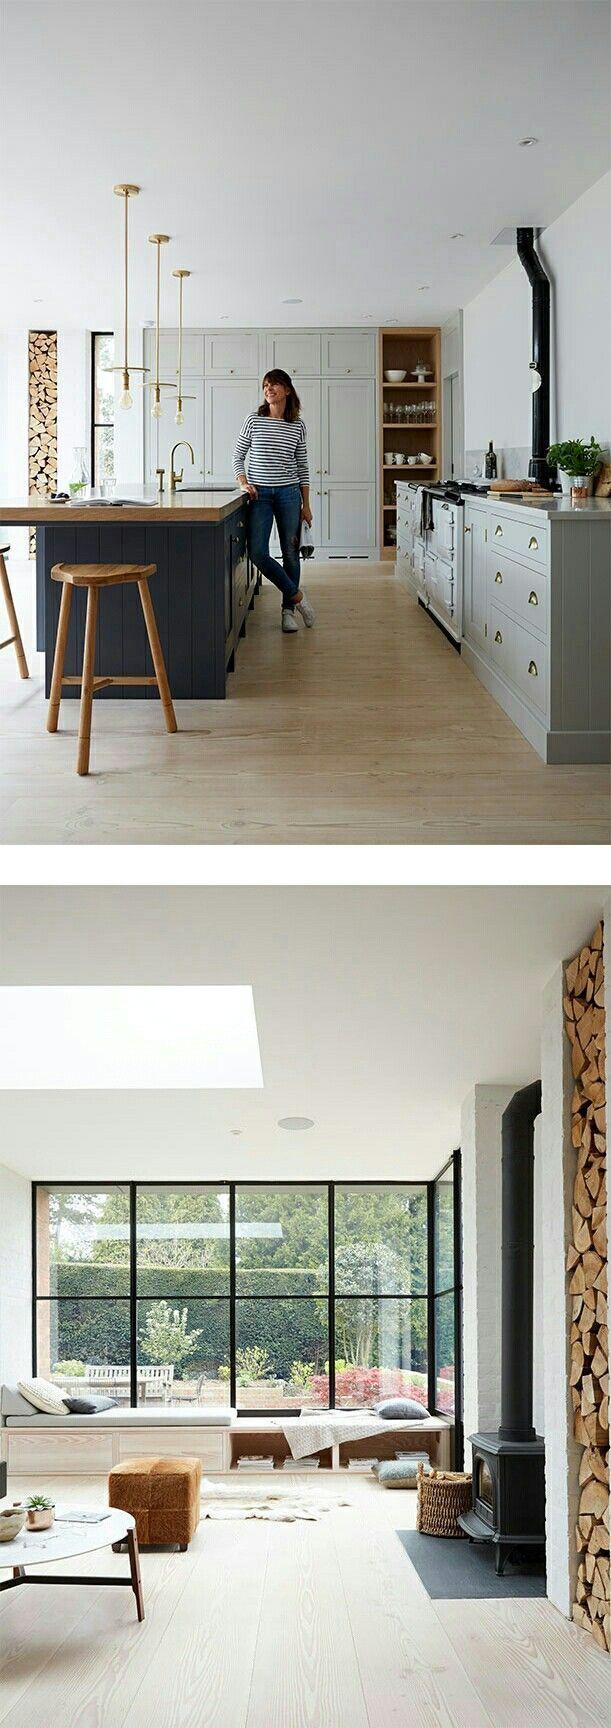 95 best Architectural details images on Pinterest | Windows ...